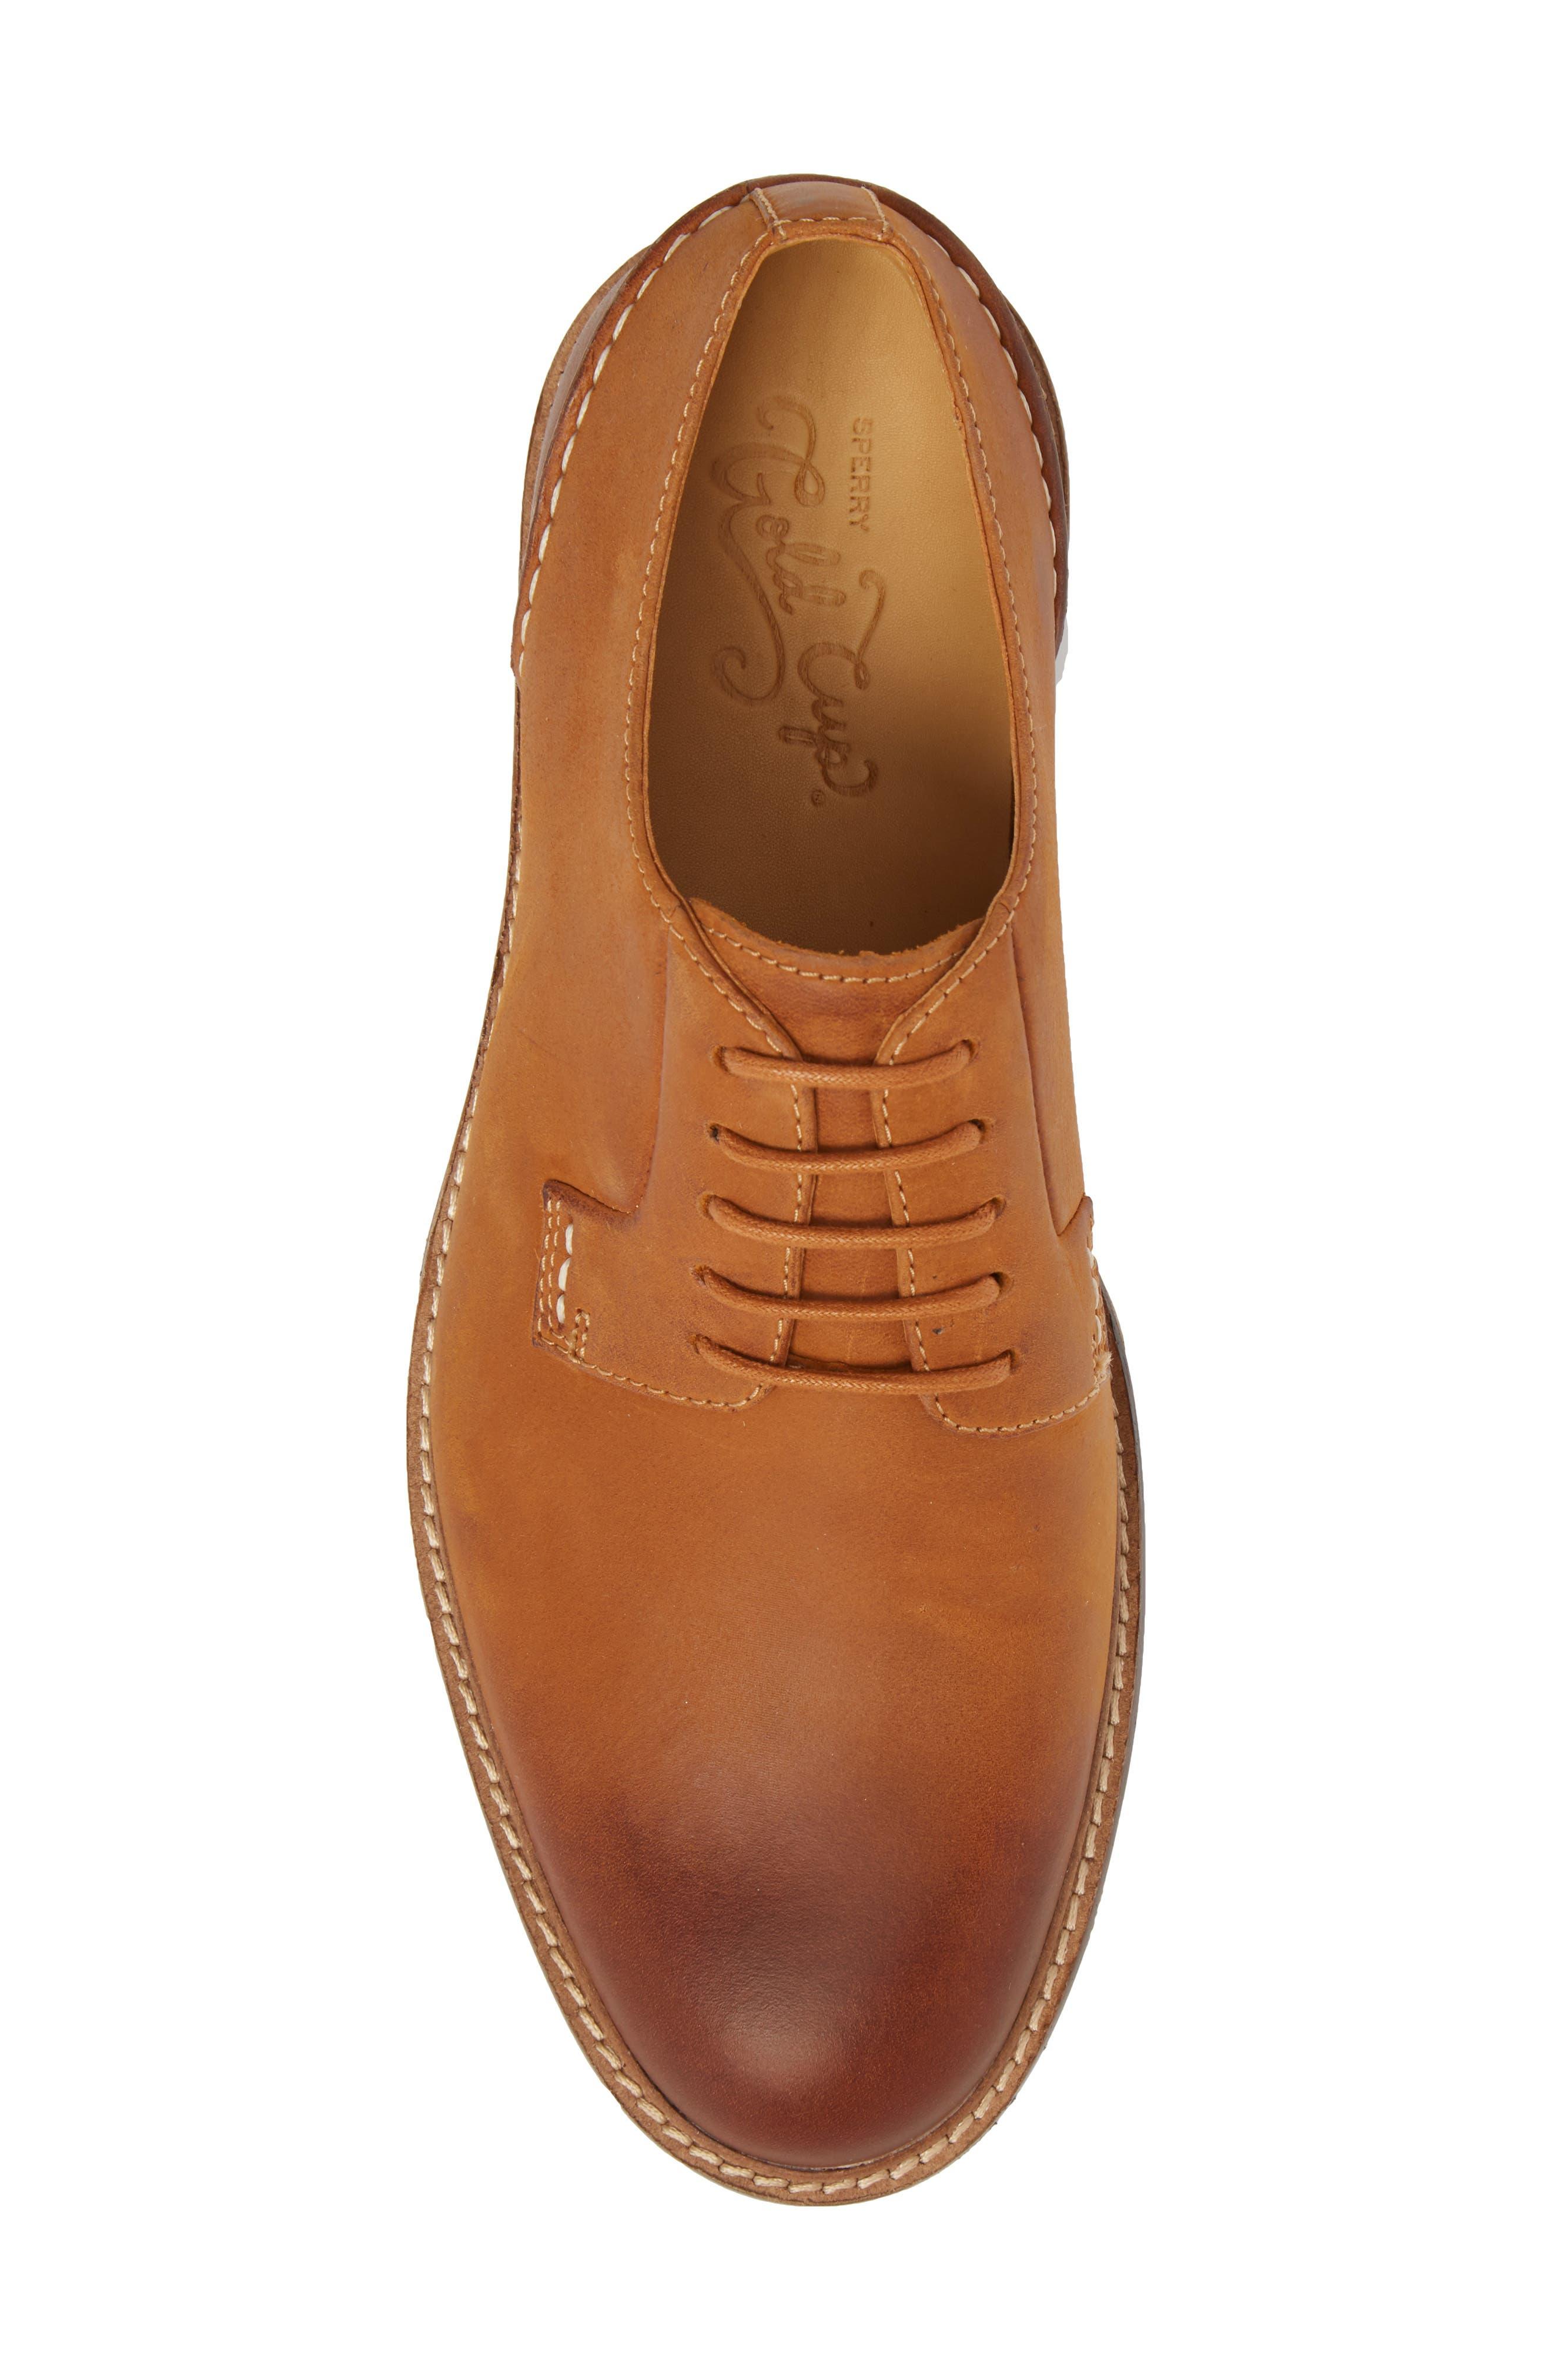 Gold Cup Plain Toe Derby,                             Alternate thumbnail 5, color,                             Tan Leather